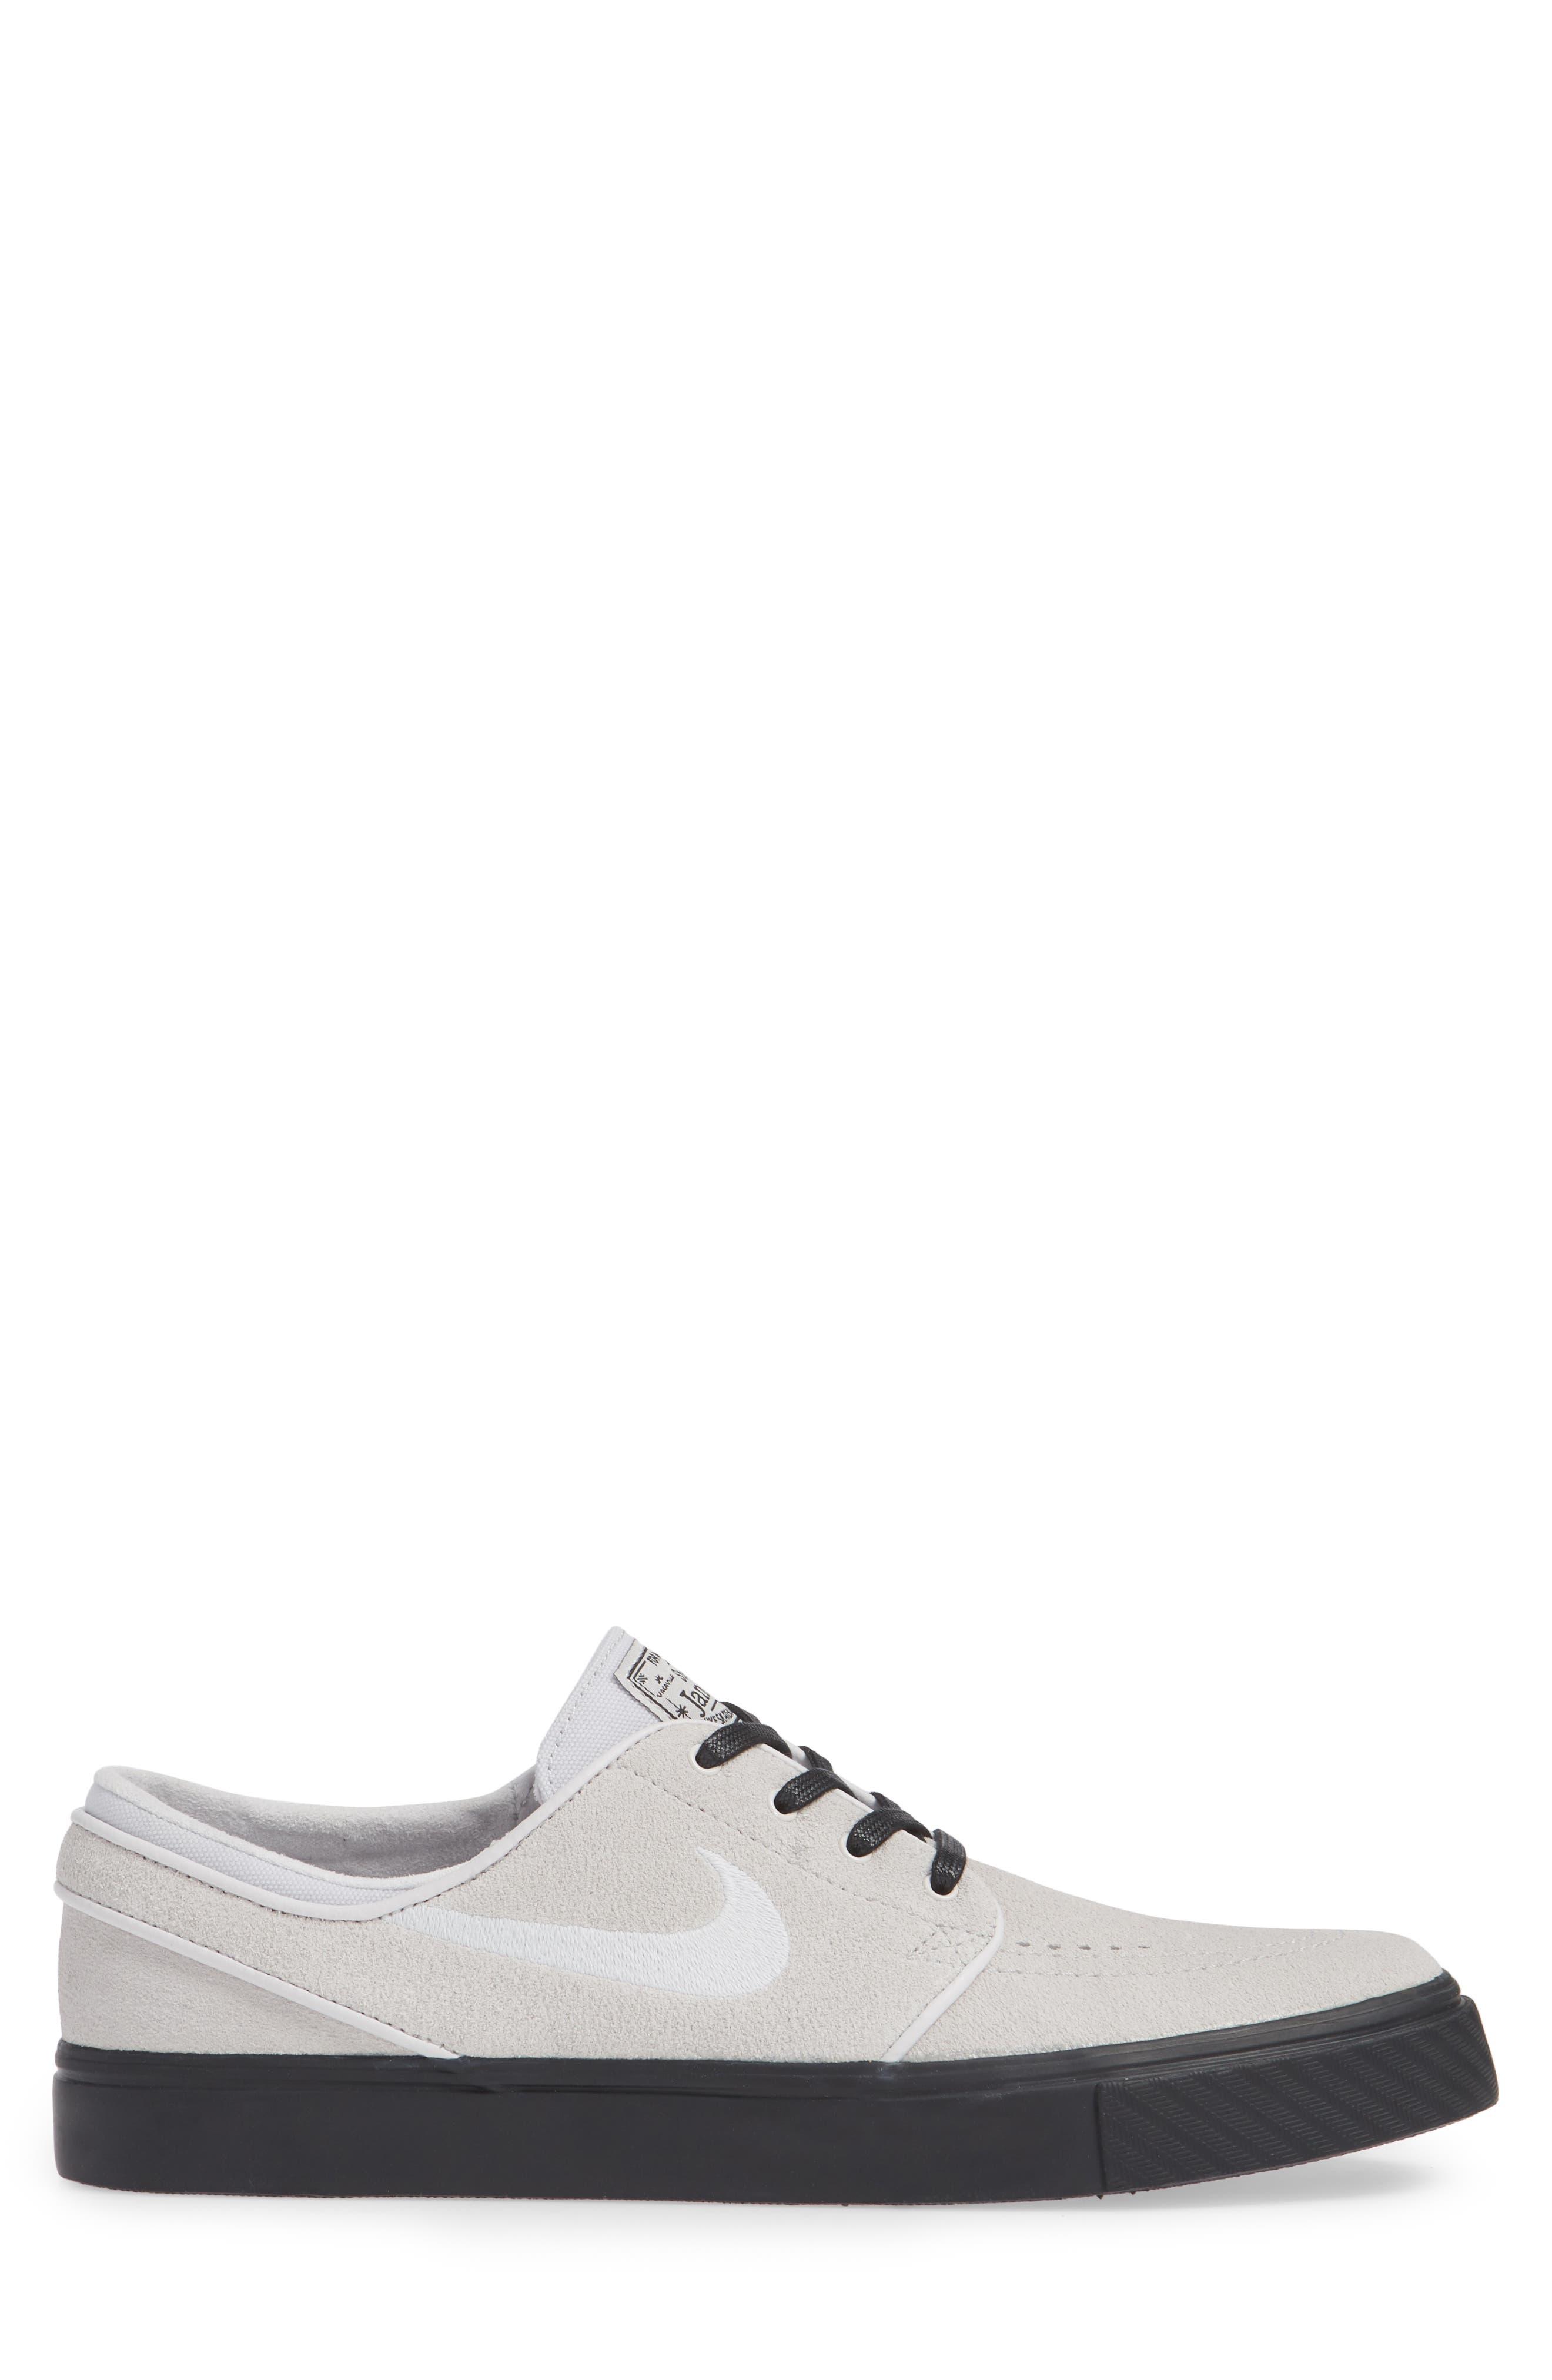 'Zoom - Stefan Janoski' Skate Shoe,                             Alternate thumbnail 3, color,                             068